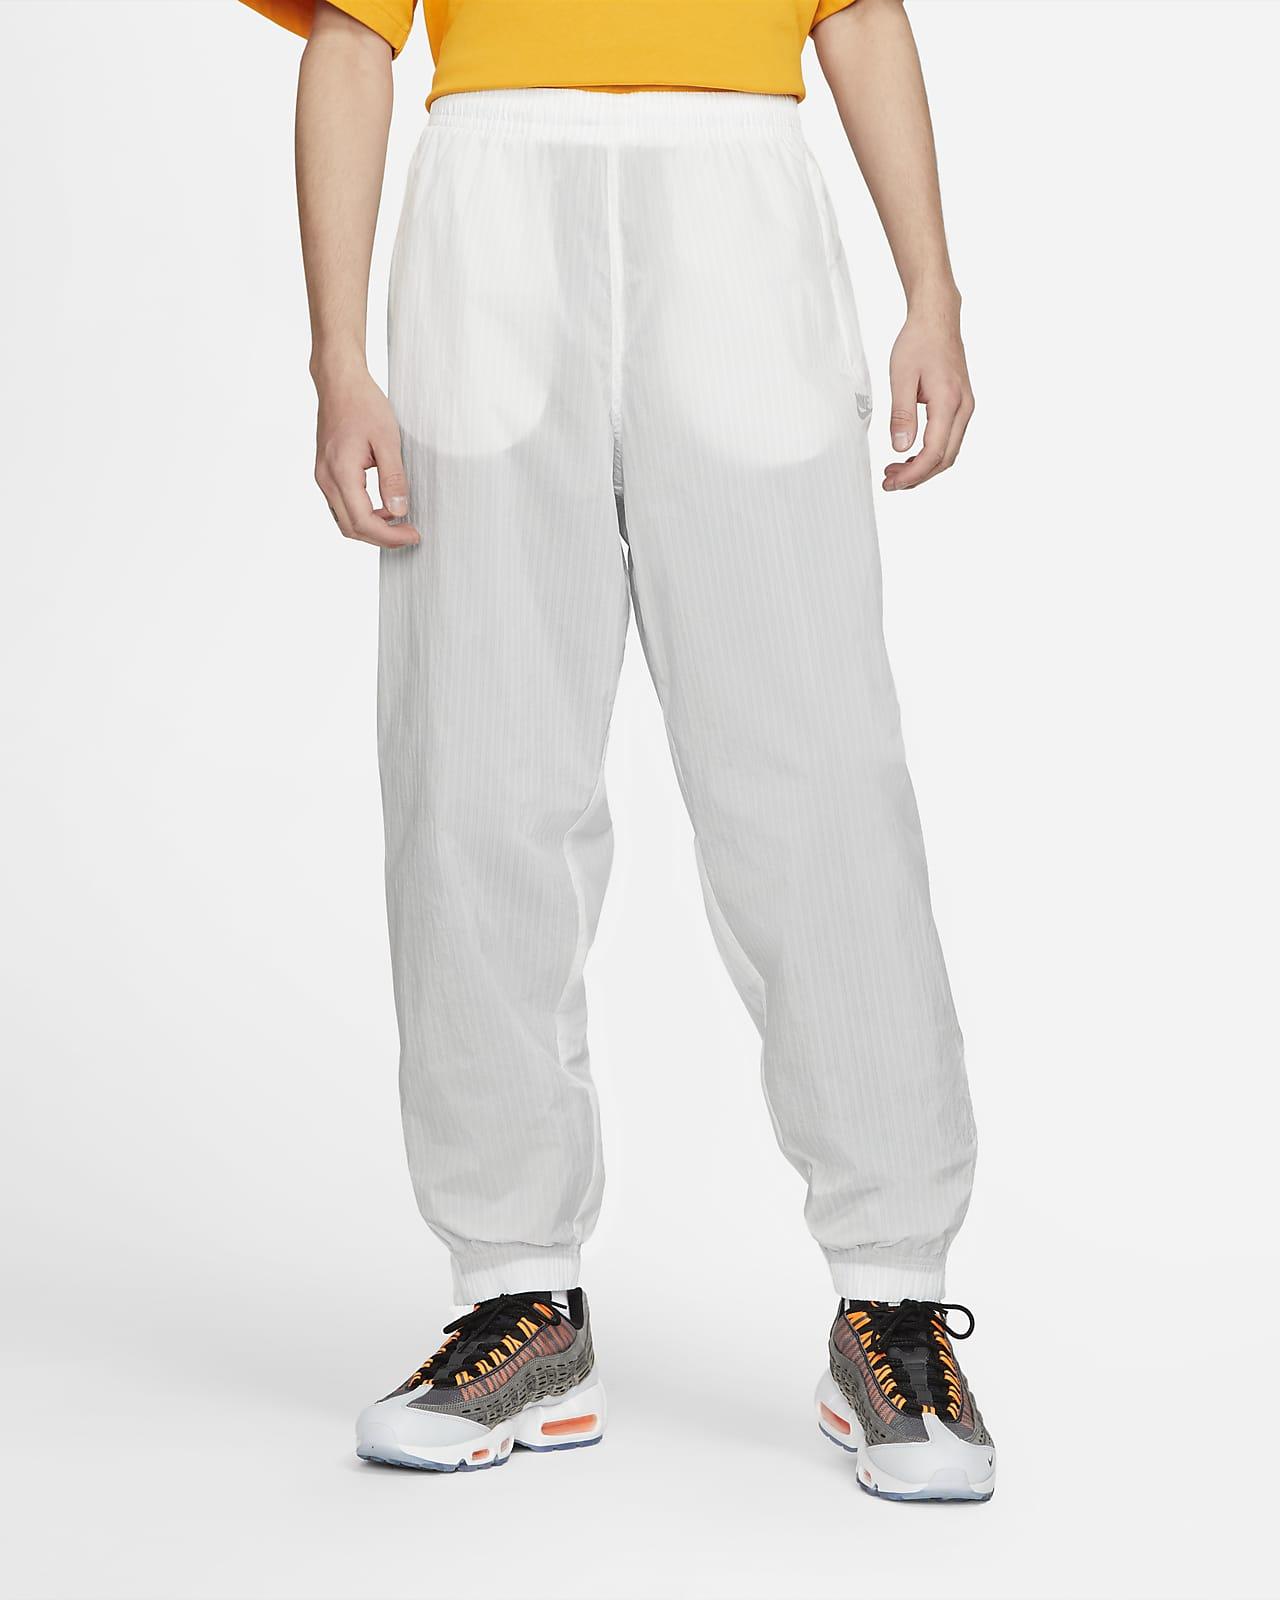 Nike x Kim Jones Allover Print Track Pants